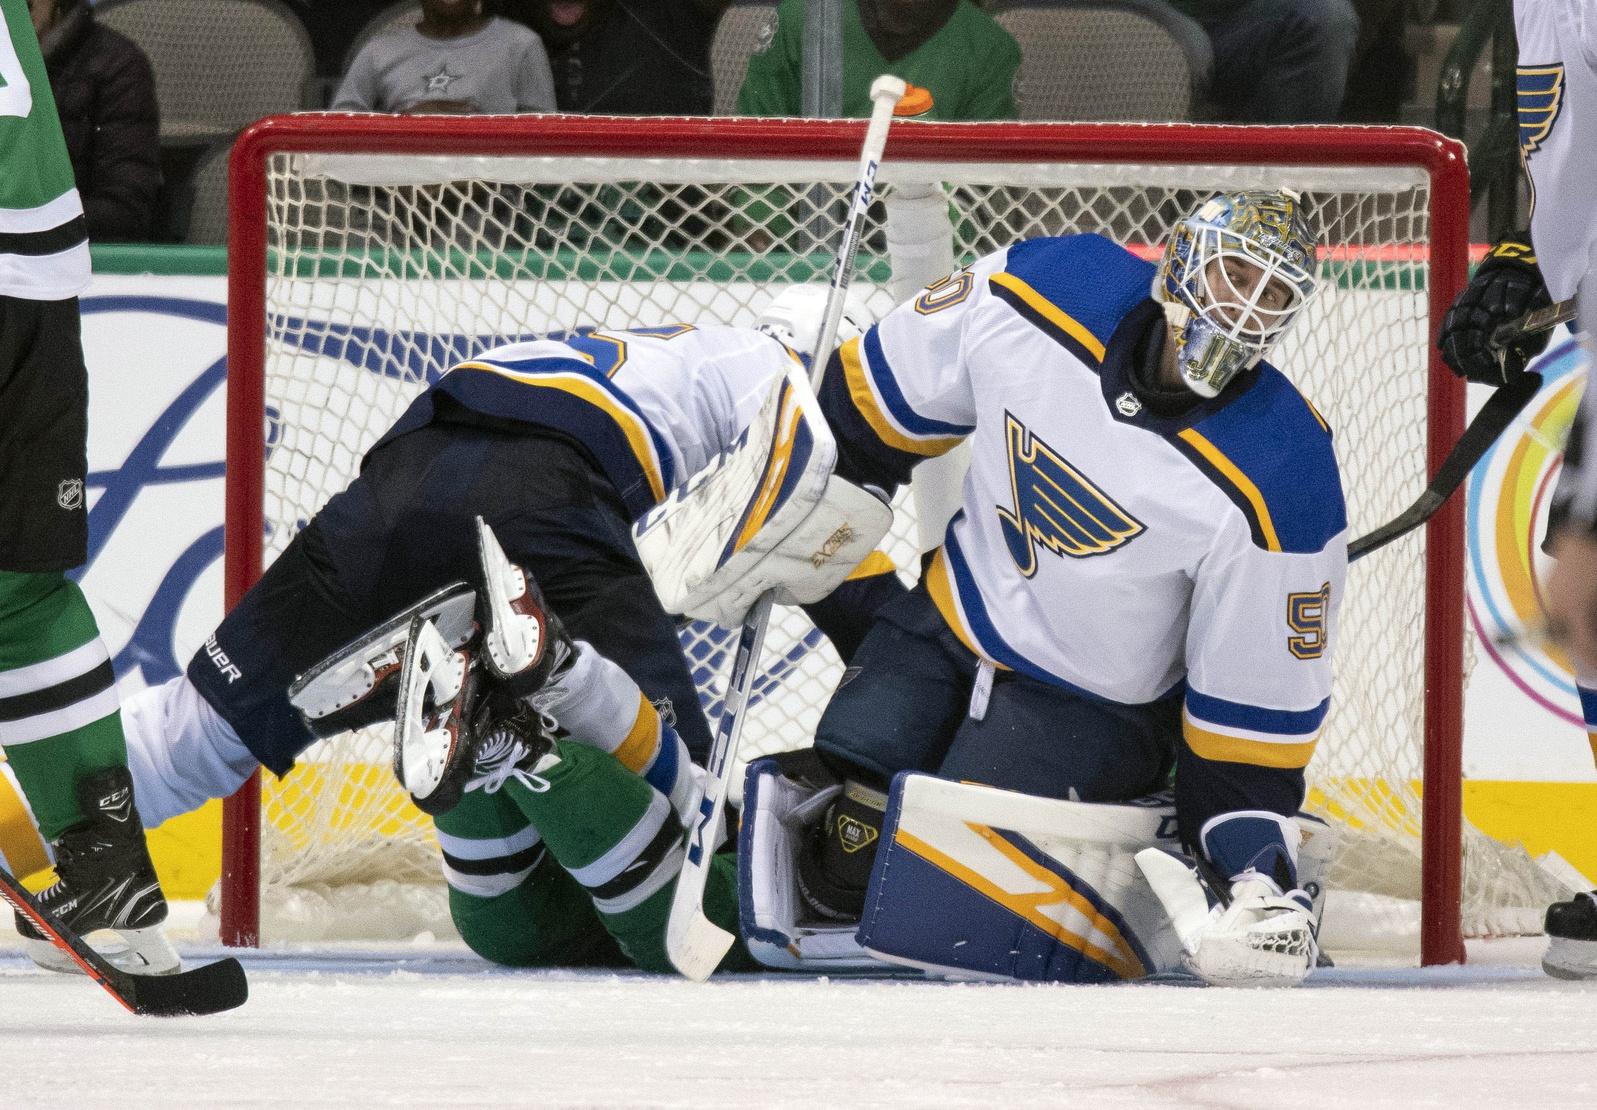 Jordan Binnington is passing up Ville Husso as the Blues' top AHL goalie